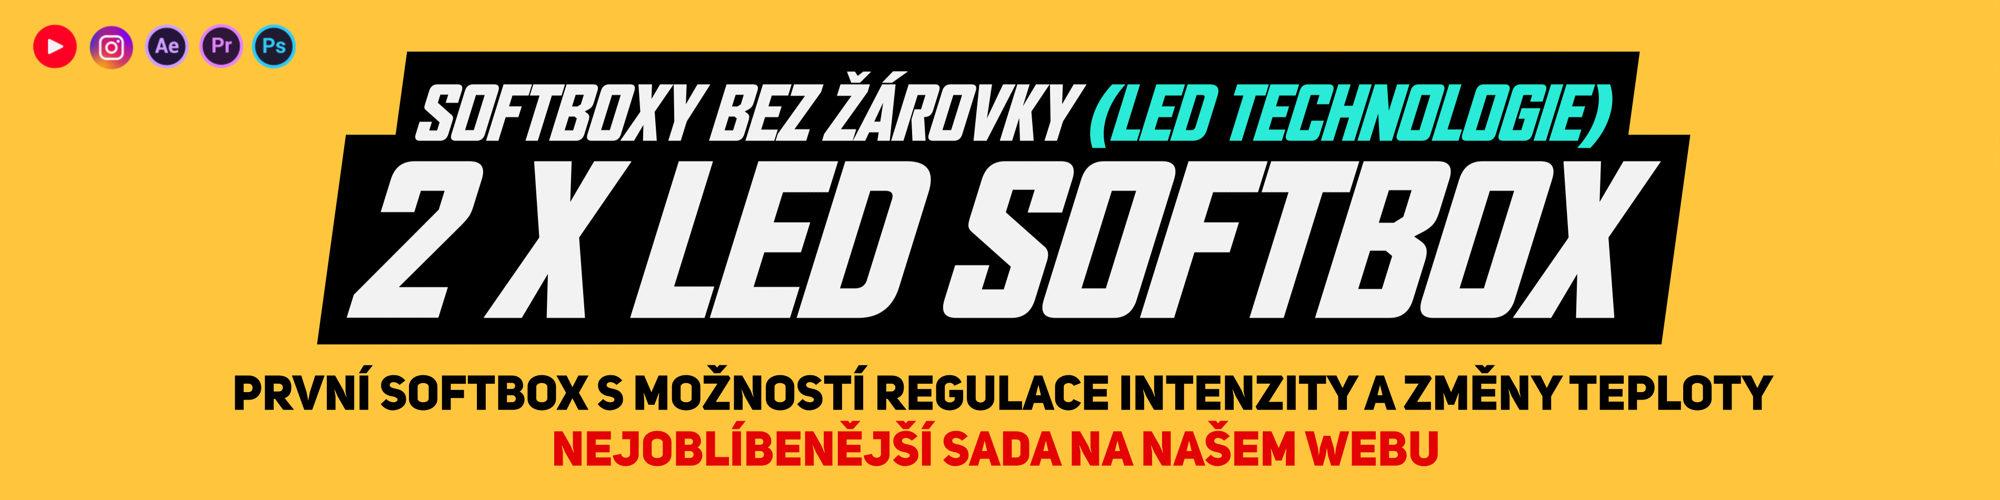 led_bez_zarovky